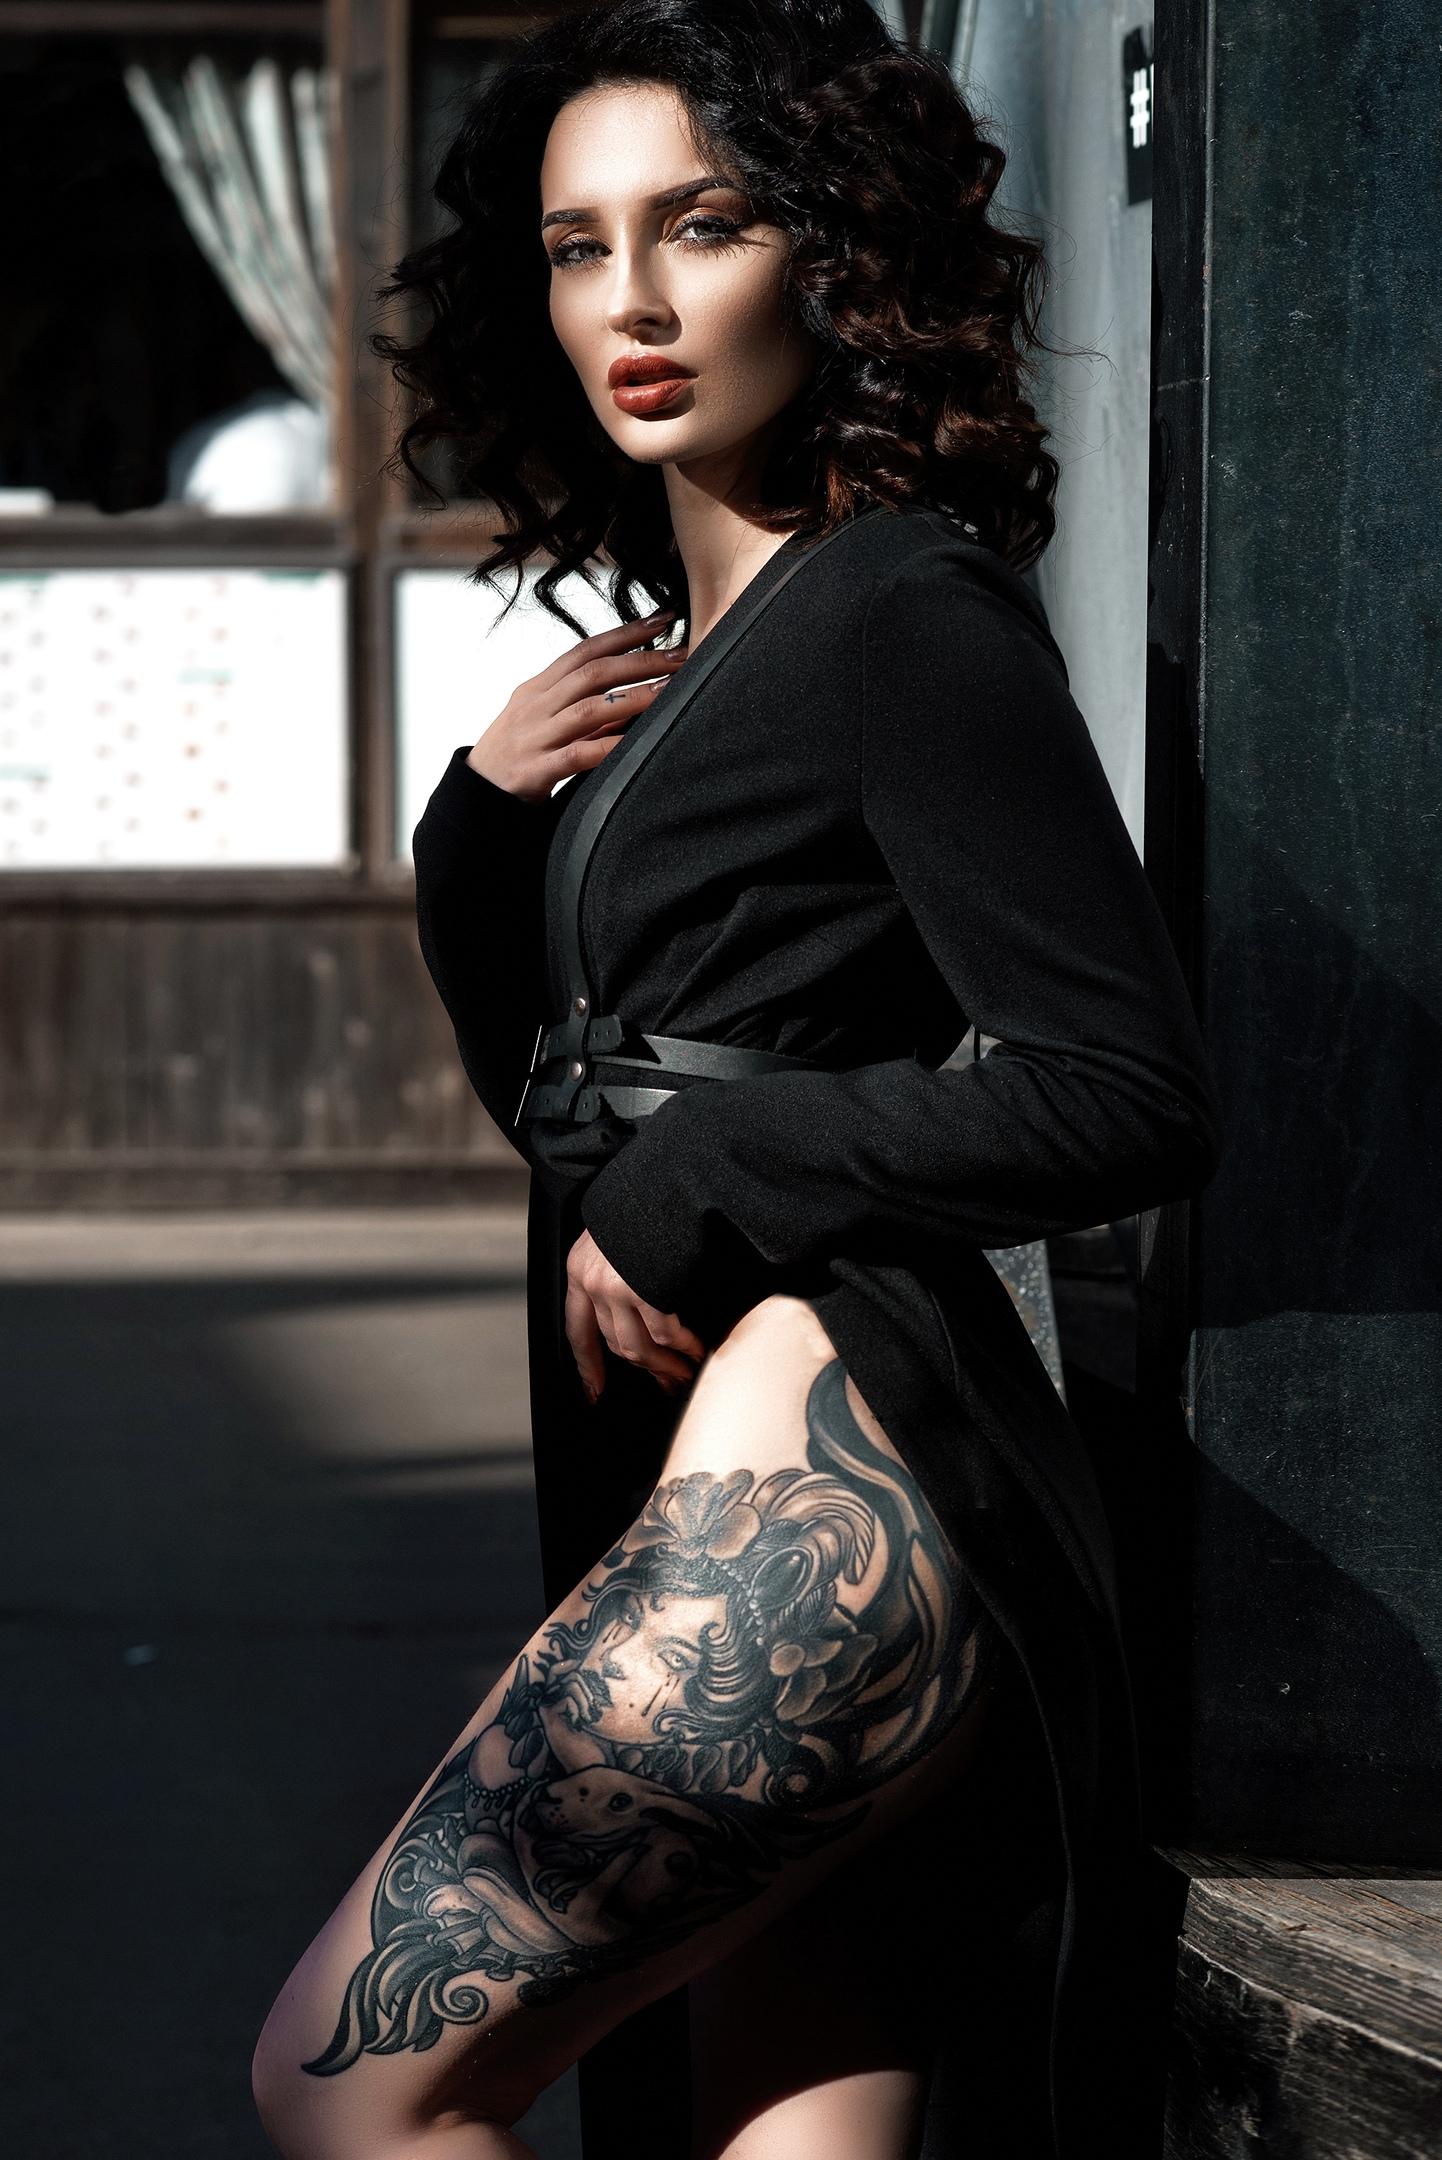 Tattoo Model  - cover